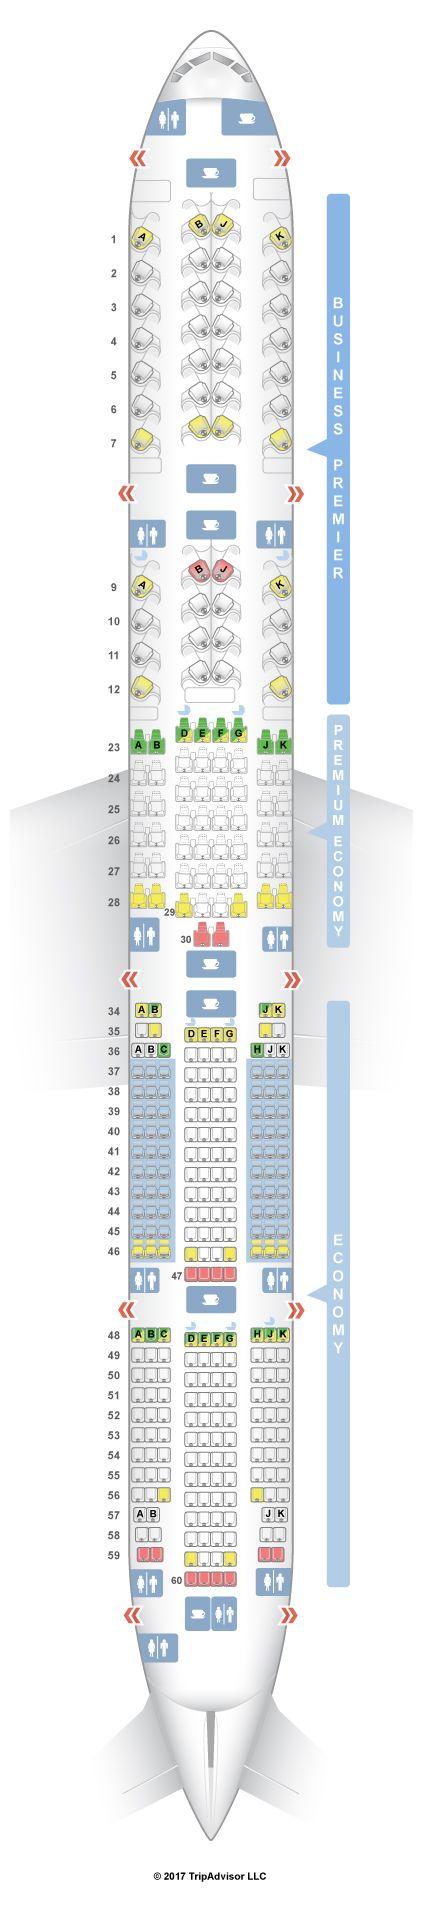 SeatGuru Seat Map Air New Zealand Boeing 777-300 (773)